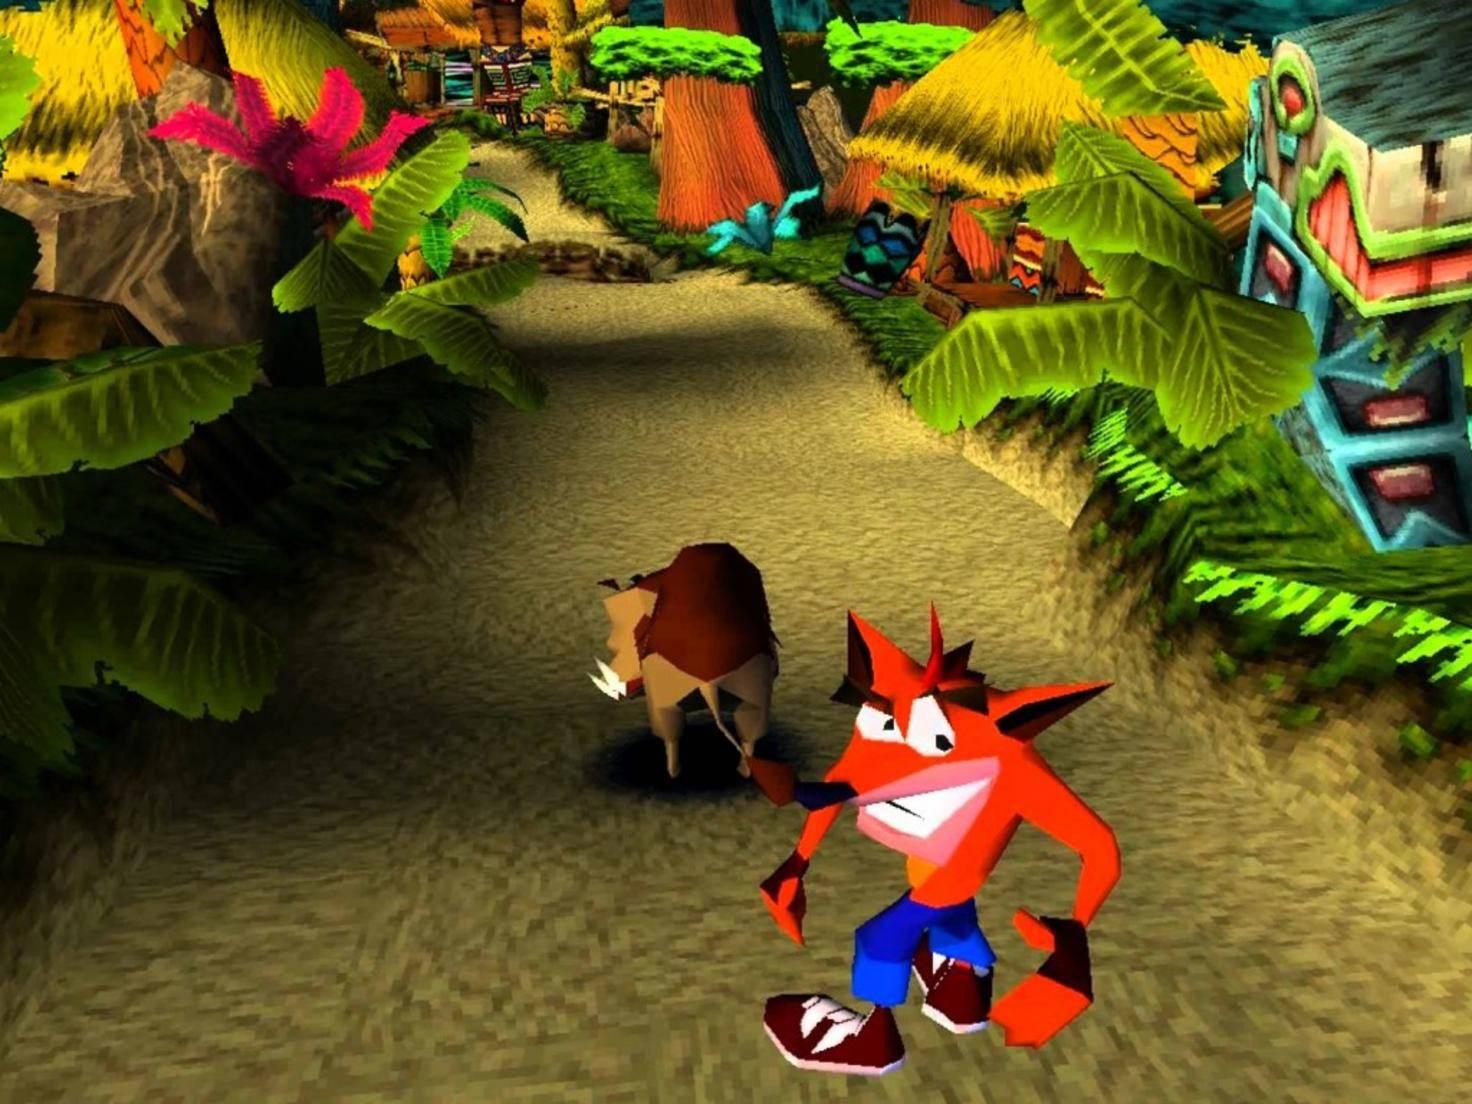 Crash Bandicoot.jpg